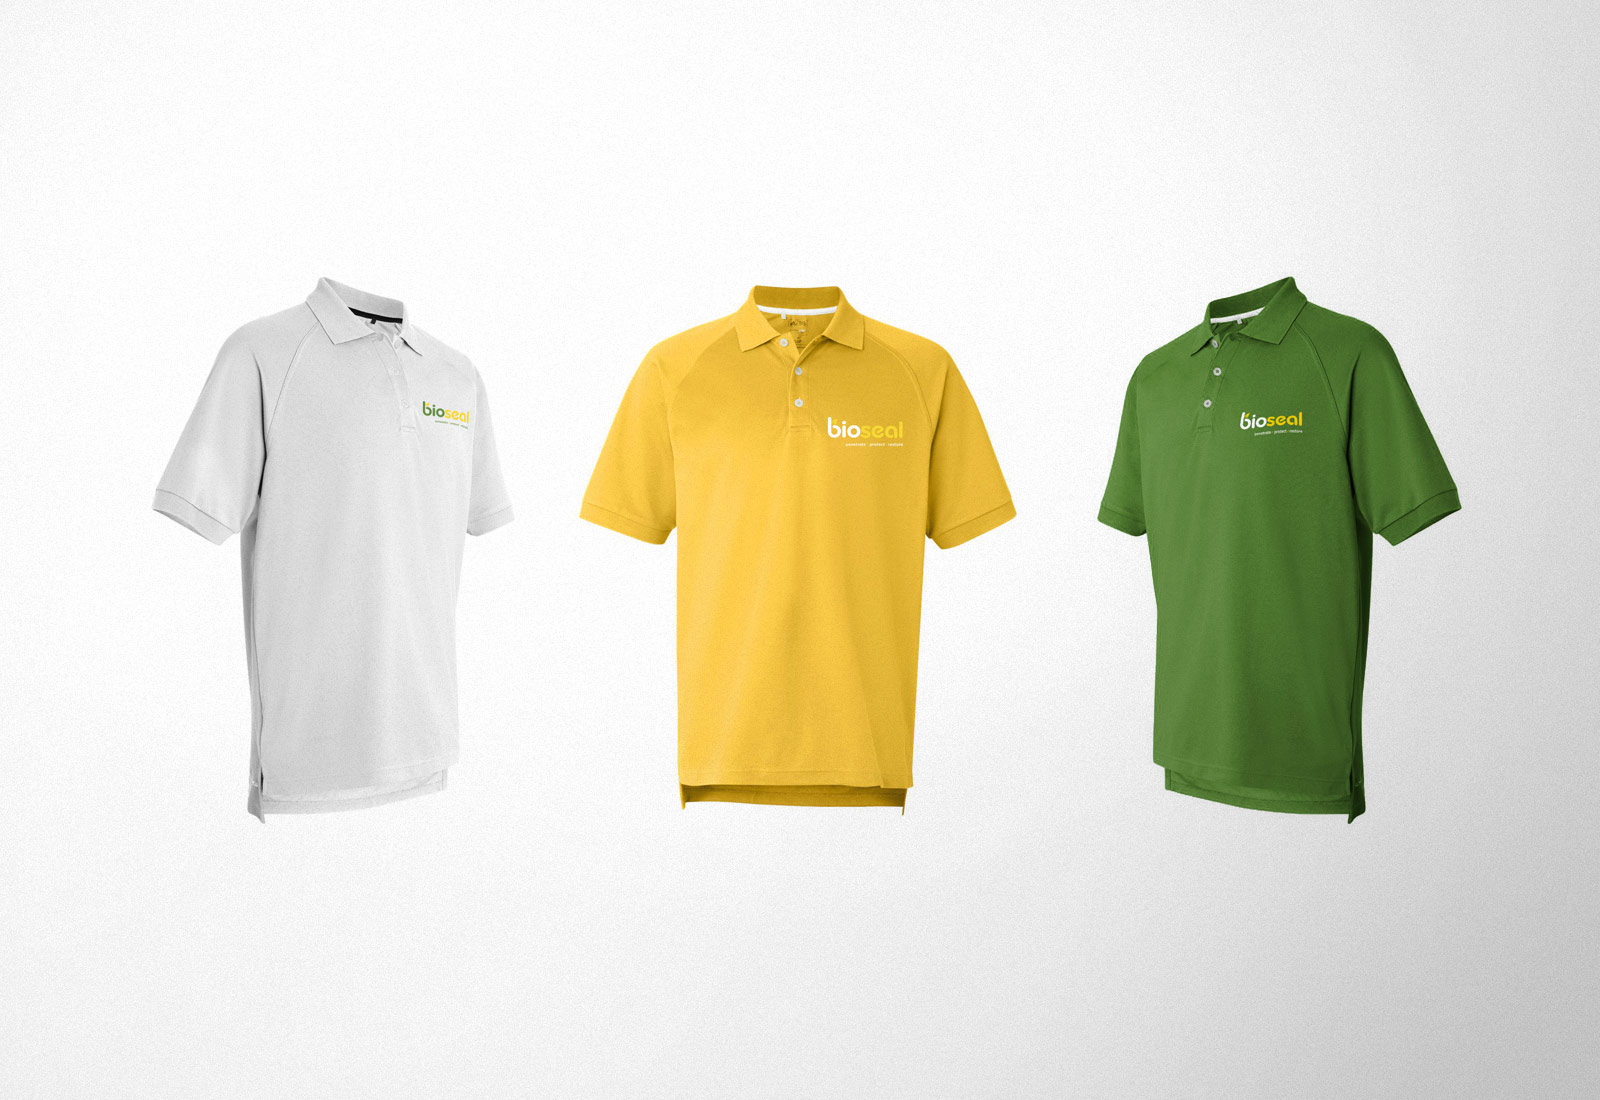 BioSeal USA Tshirts